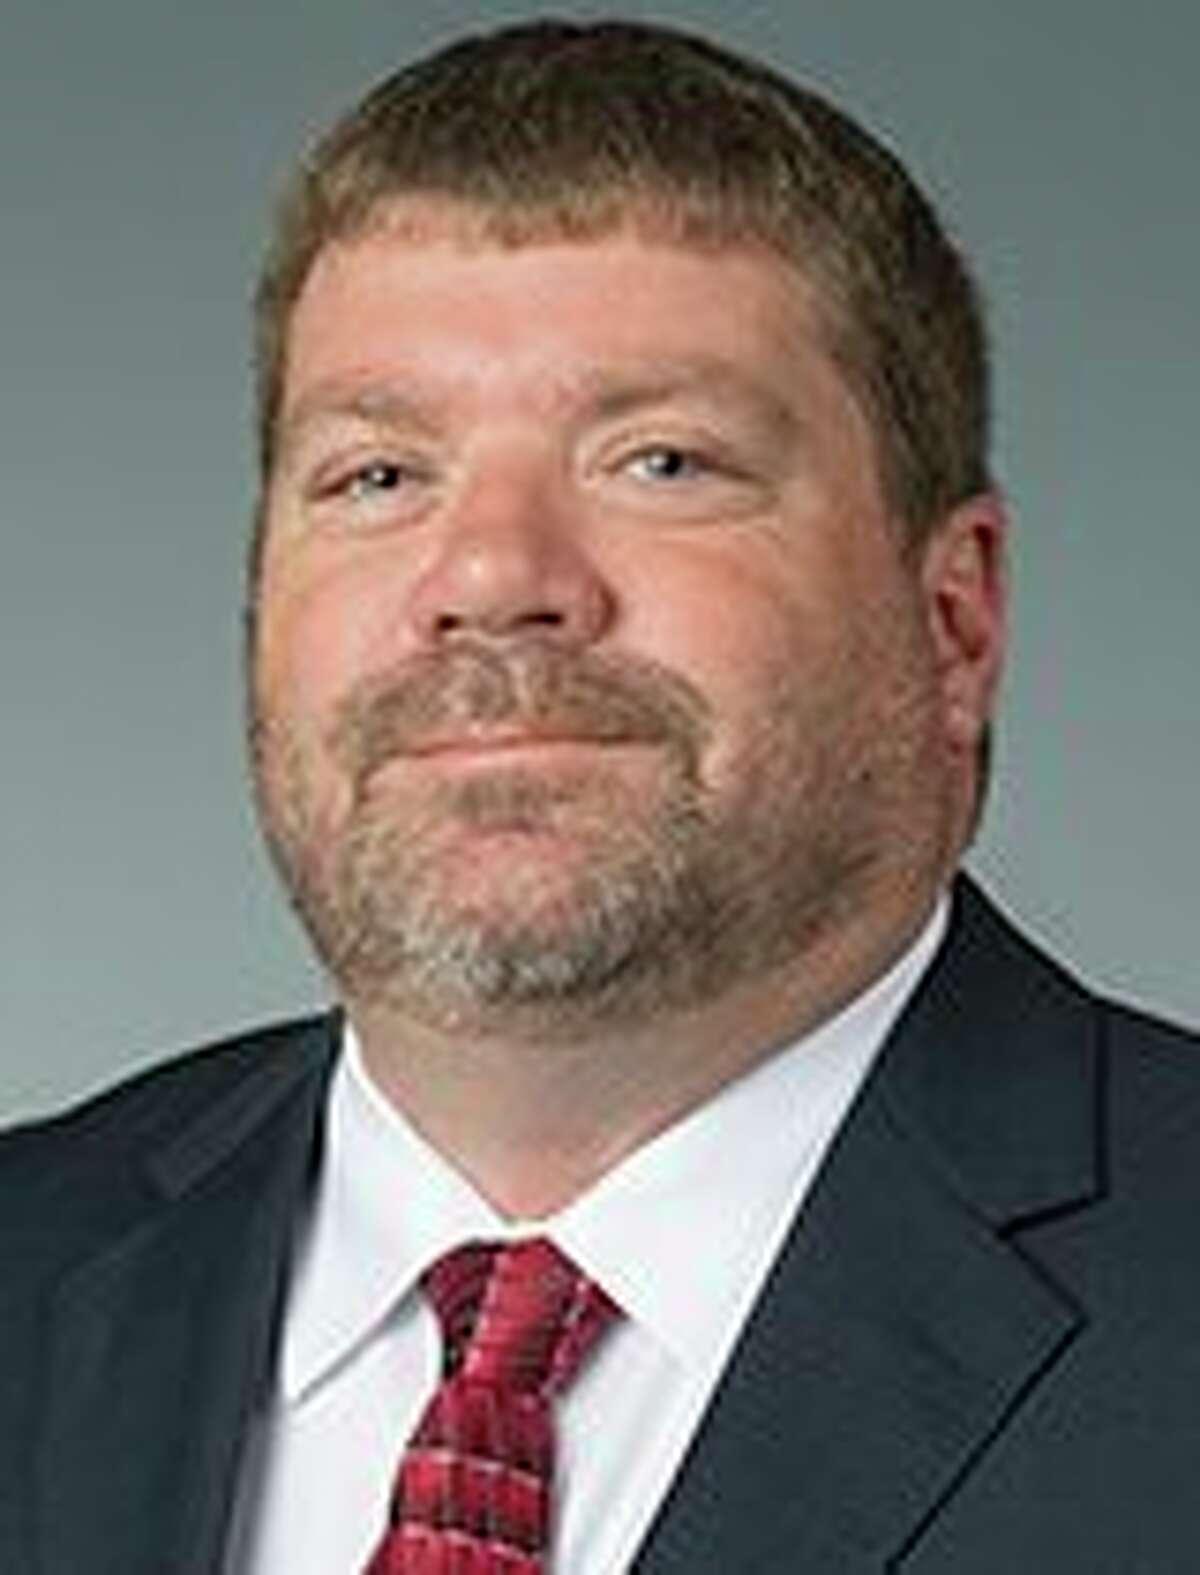 Greg Henson